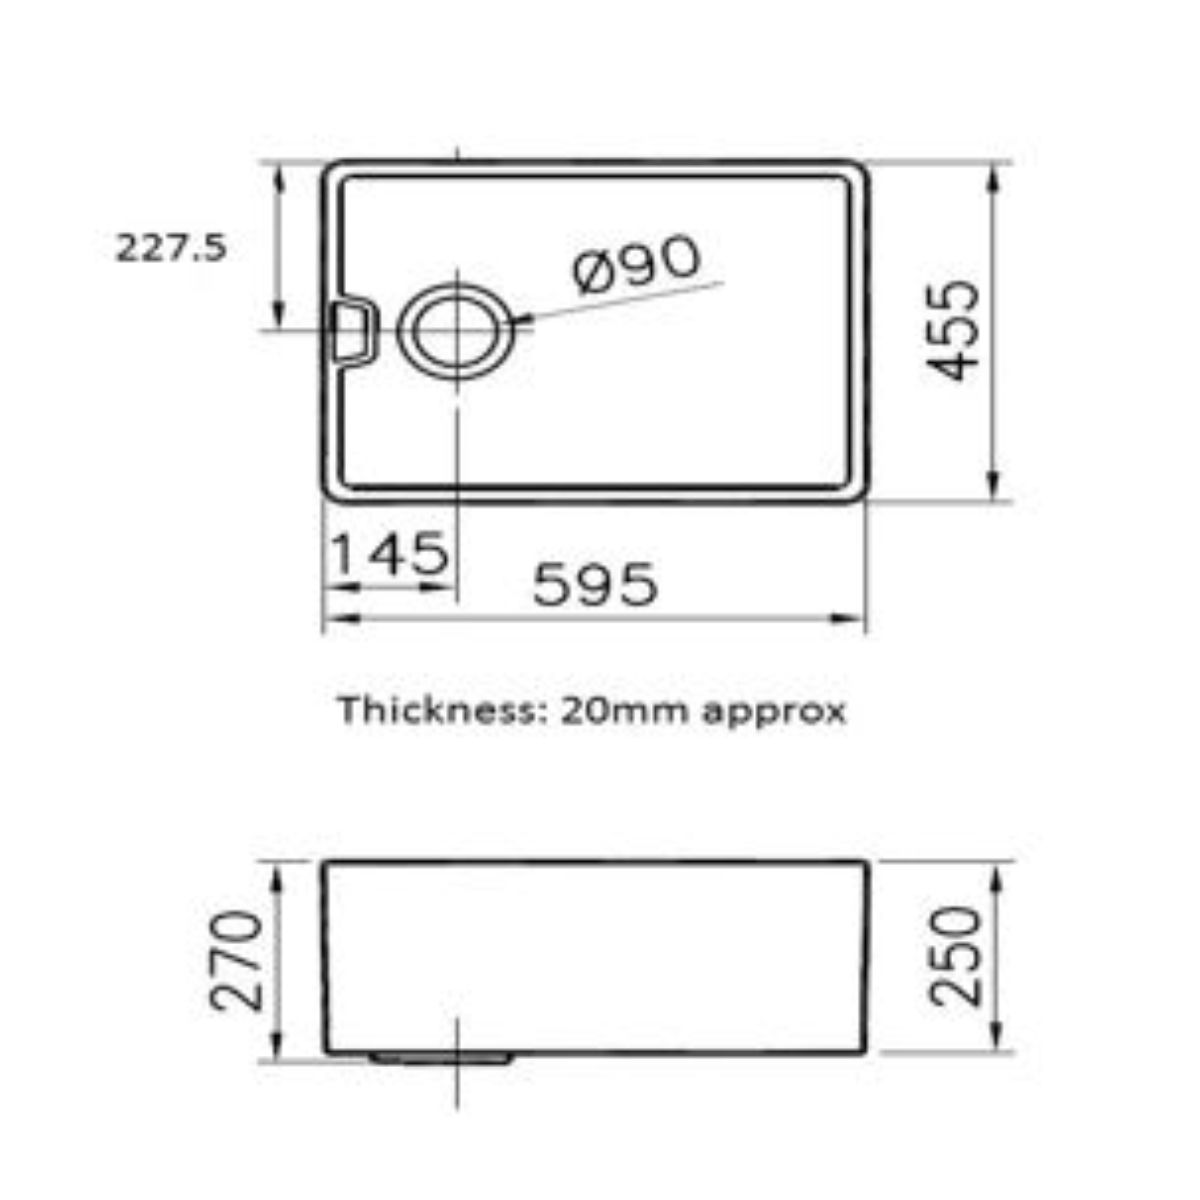 Reginox Belfast 1 Tap Hole Undermount Sink 595mm Dimensions